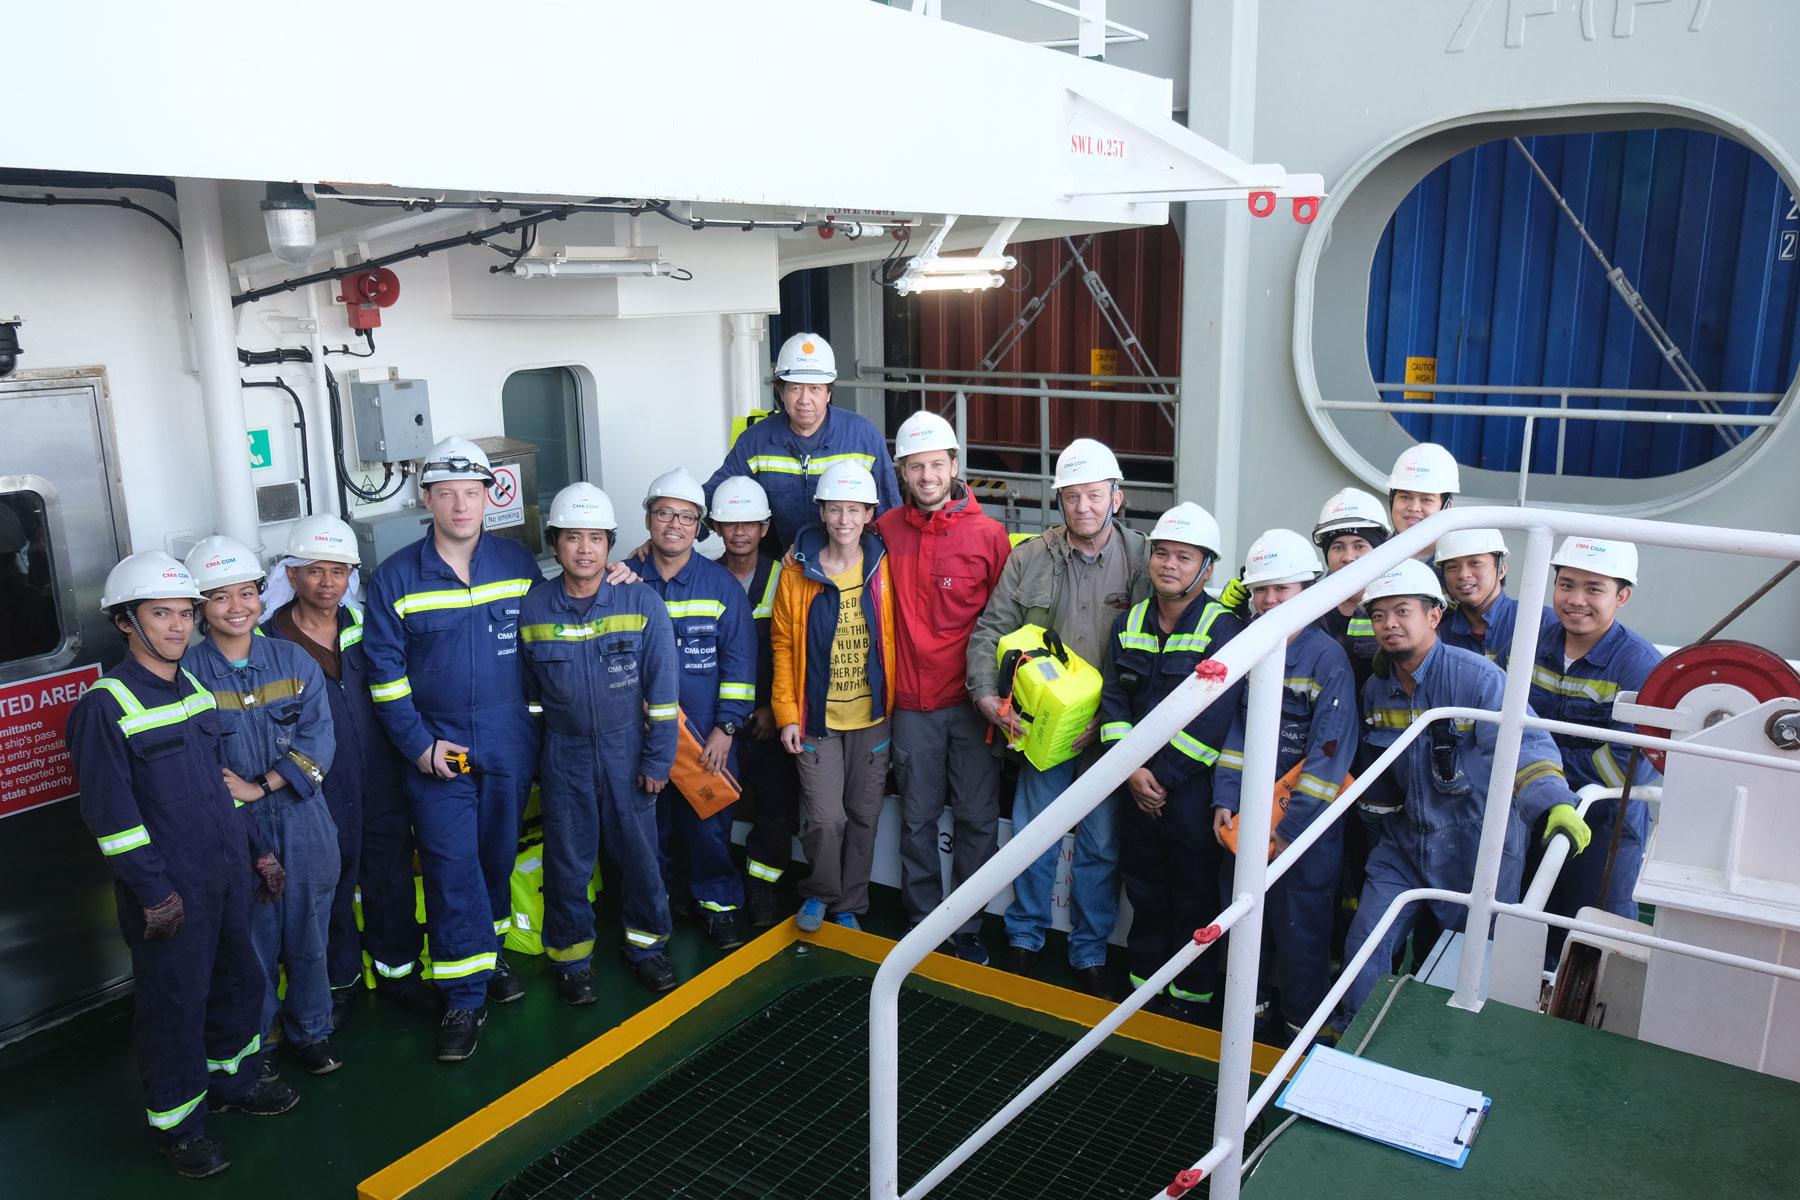 Crew und Passagiere auf dem Containerschiff Jacques Joseph.